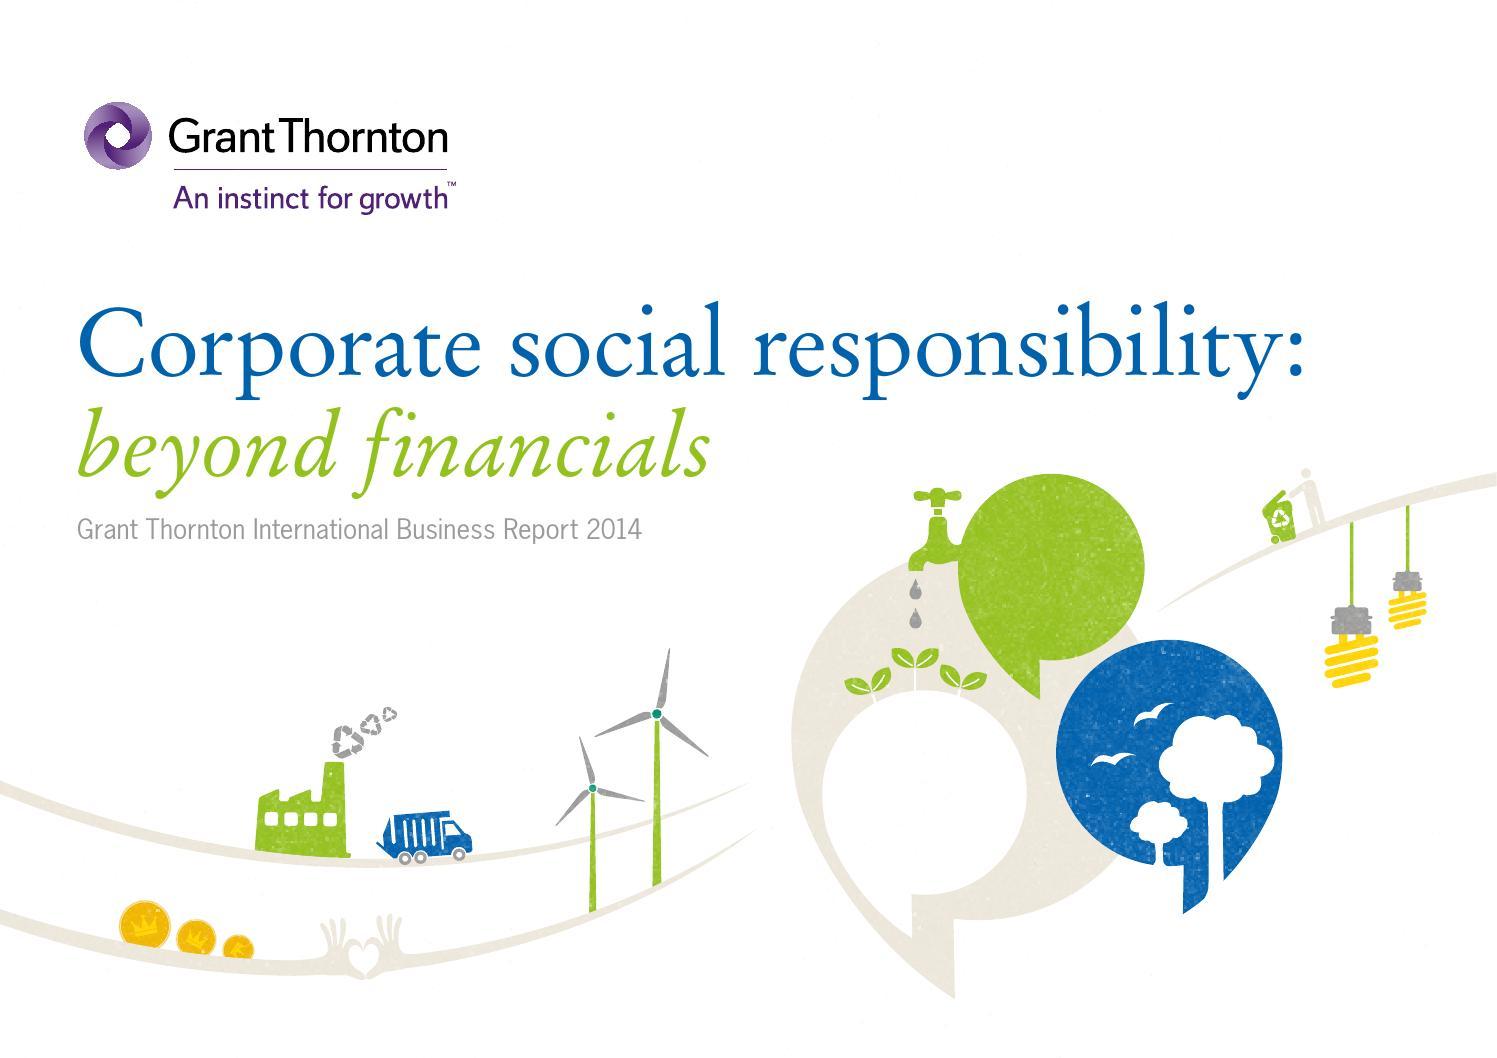 International business report (IBR)